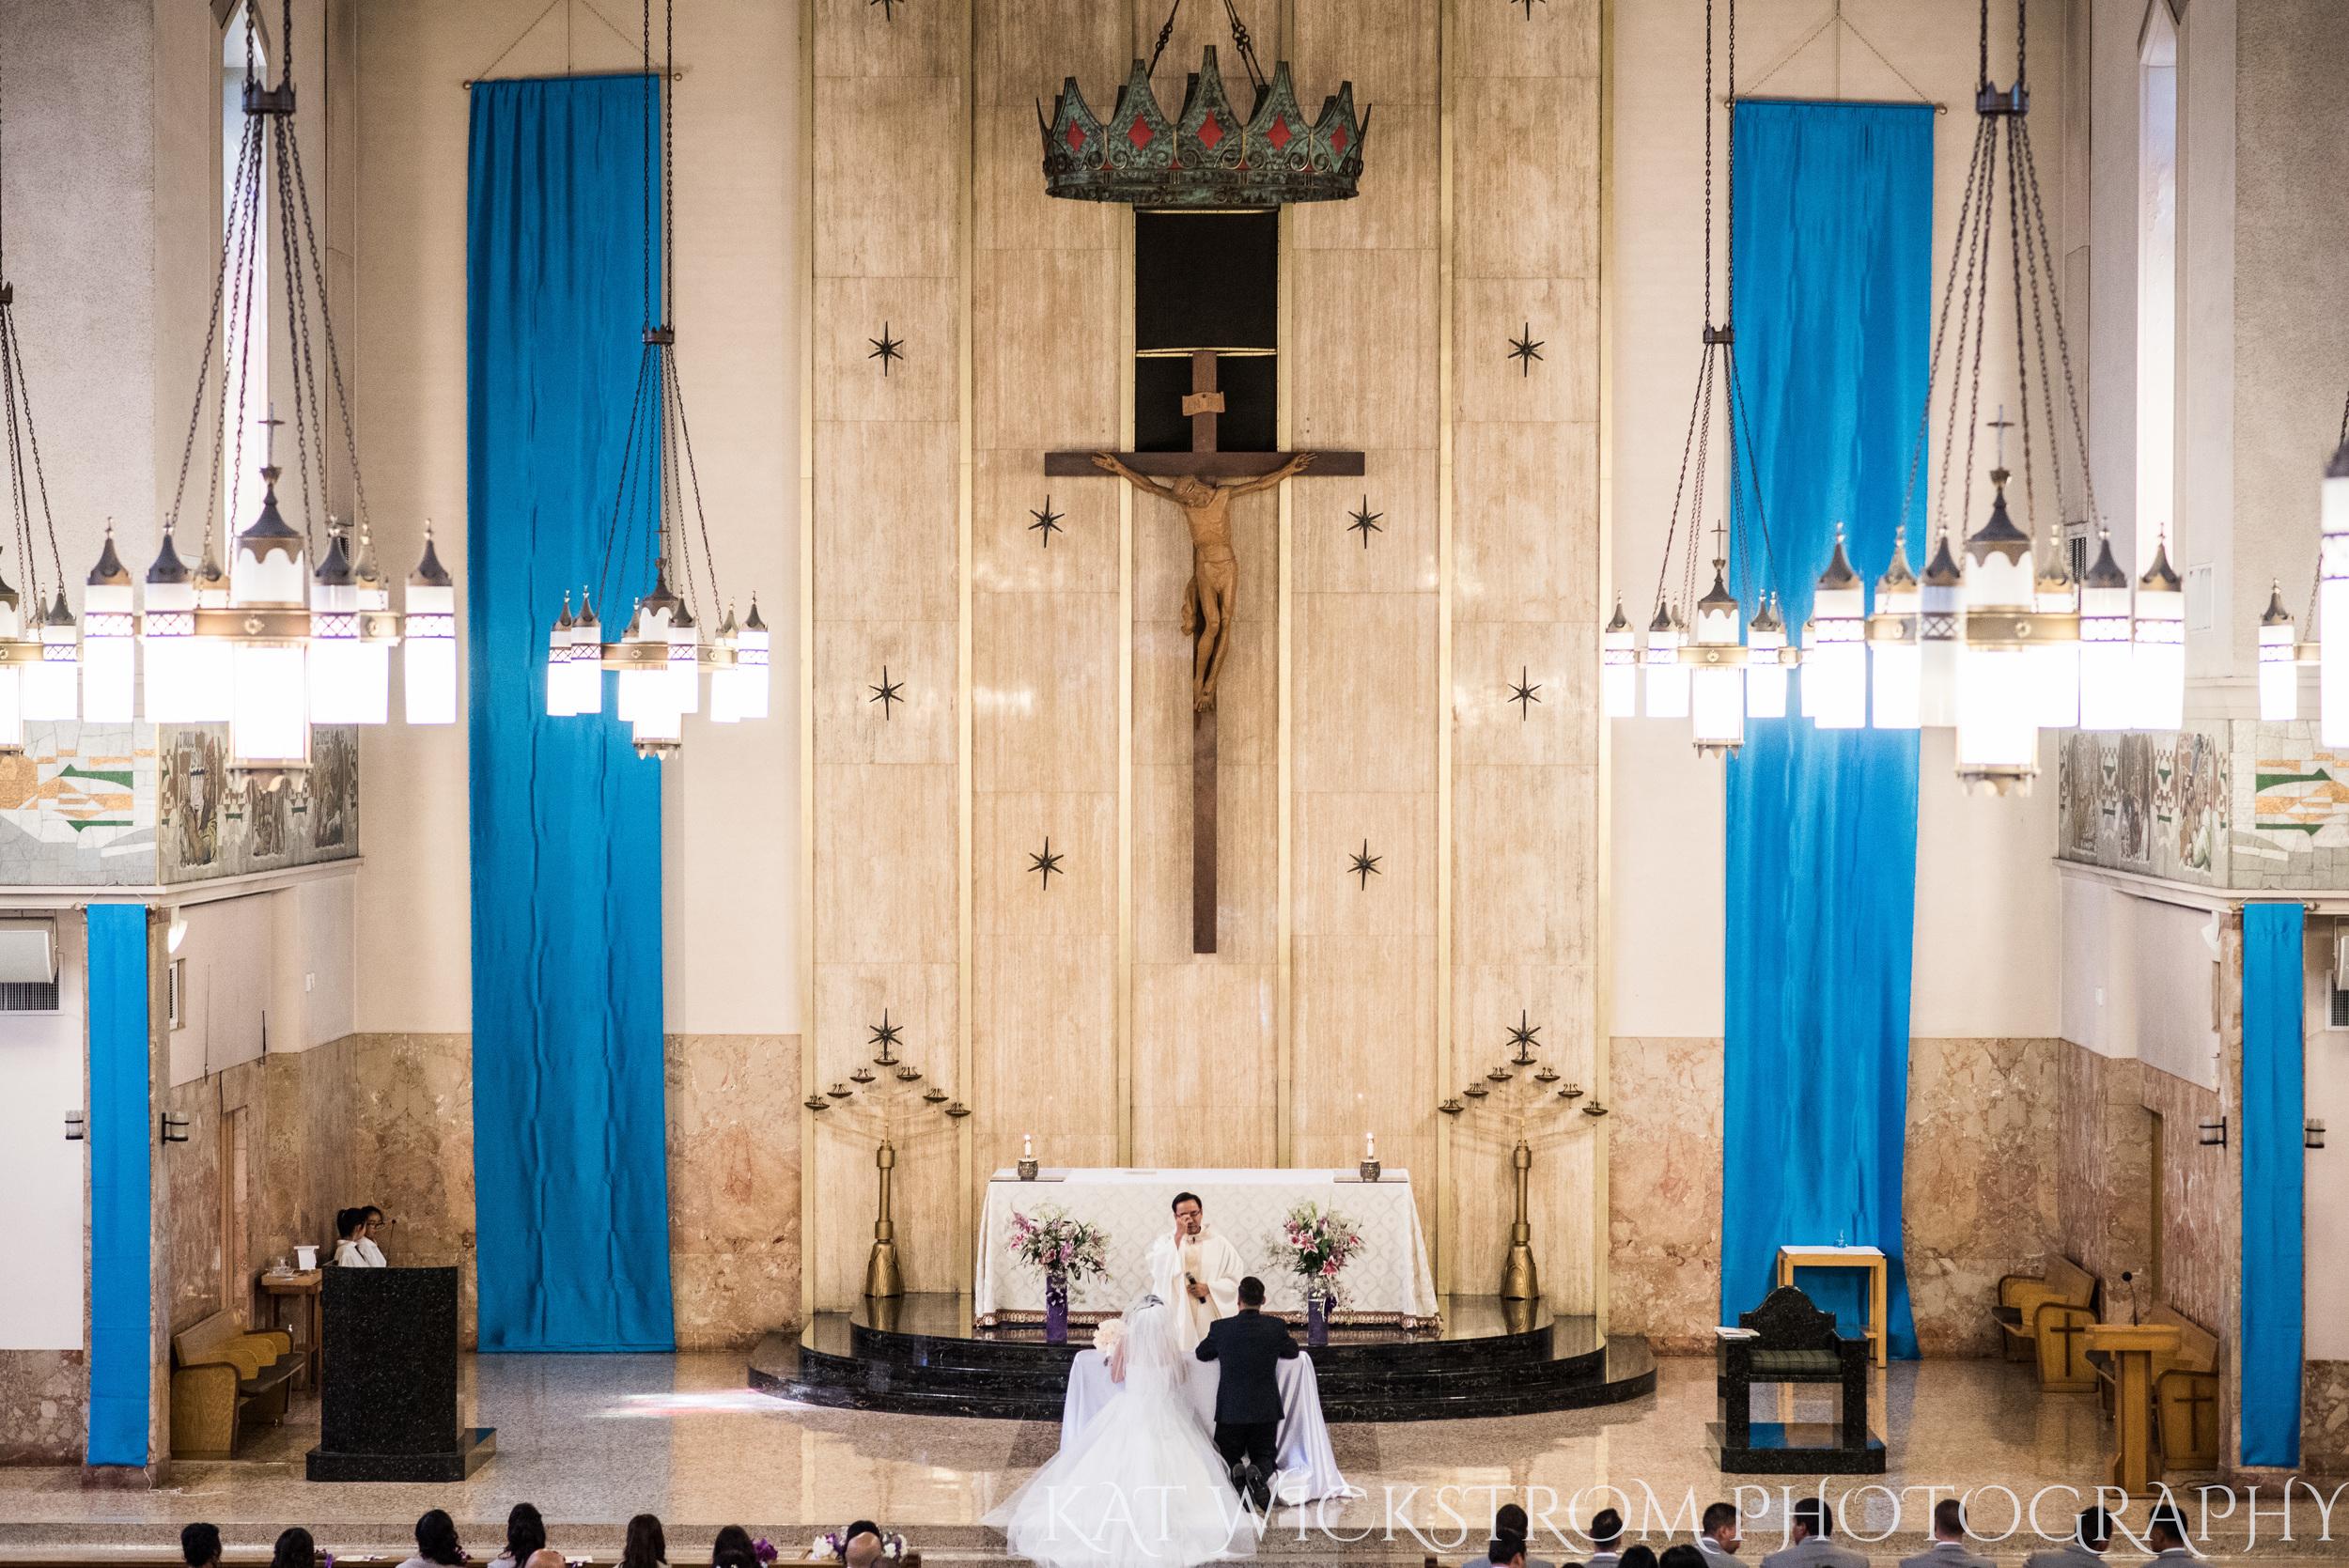 How amazing was this Catholic church ceremony?